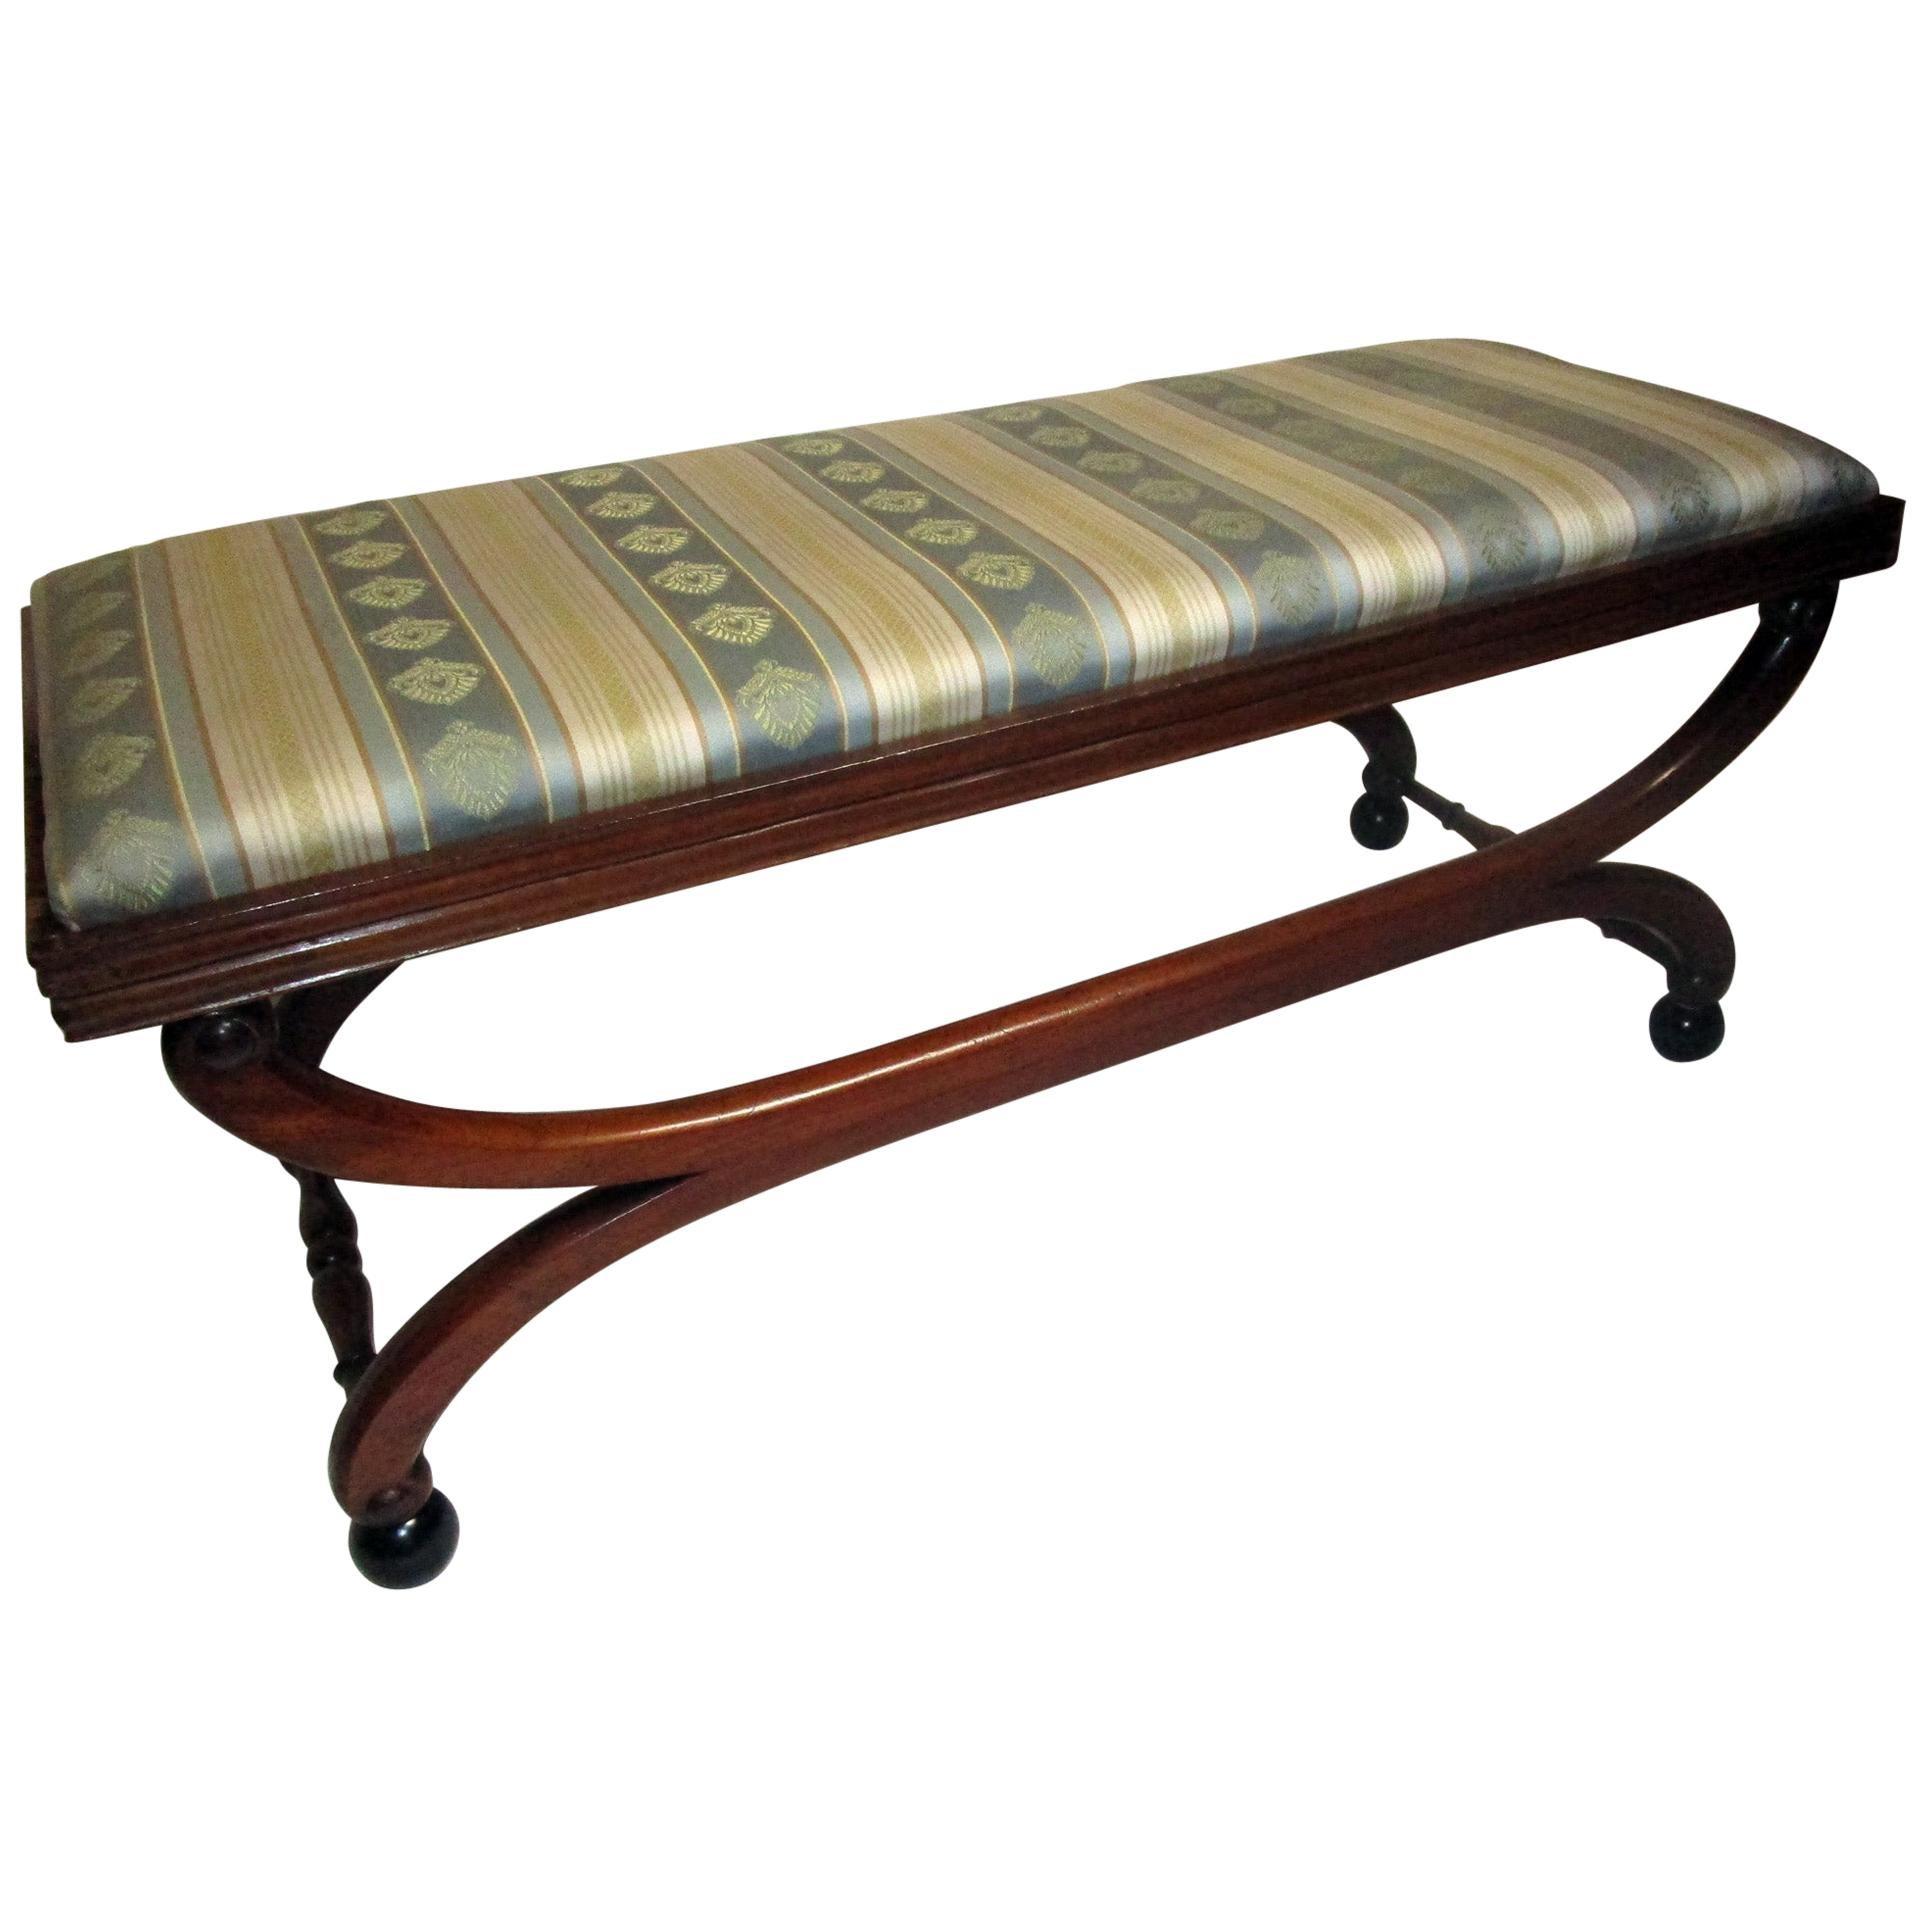 19th century English Regency Mahogany Scroll Form Bench